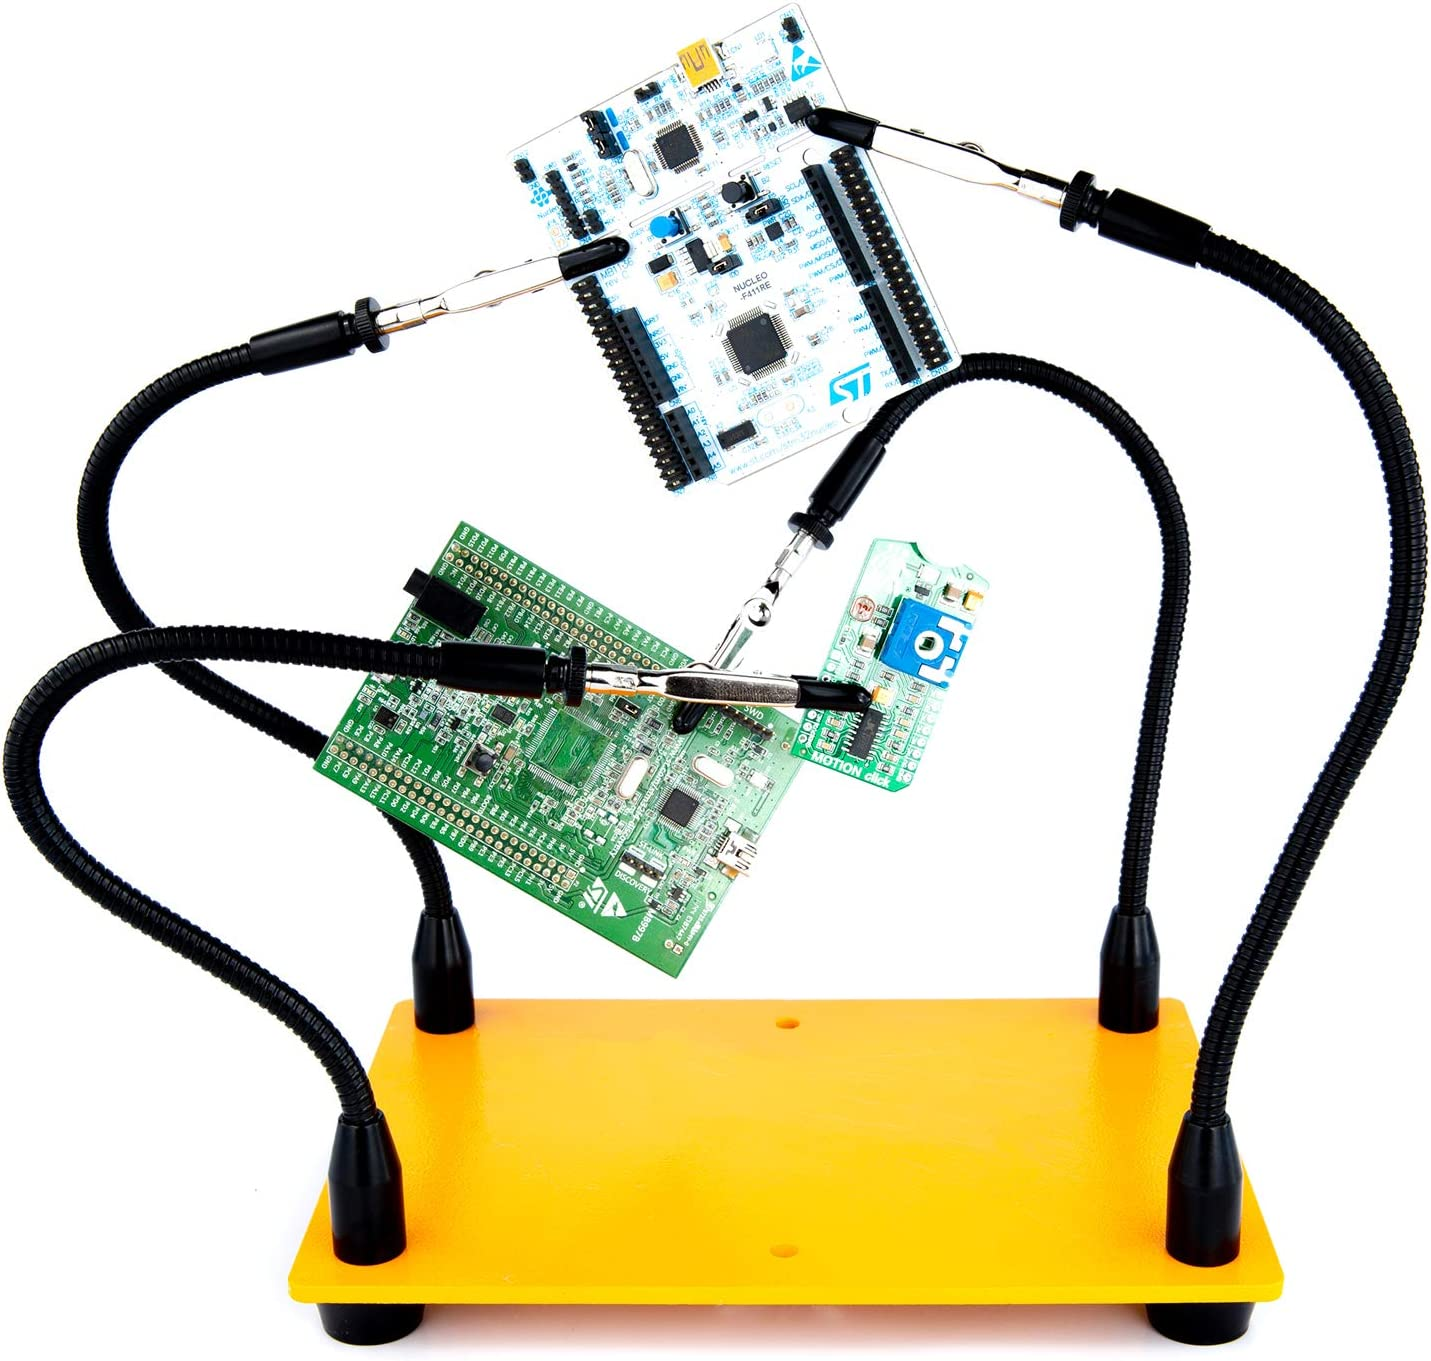 Asistente de soldadura p/ componentes electronicos o joyeria